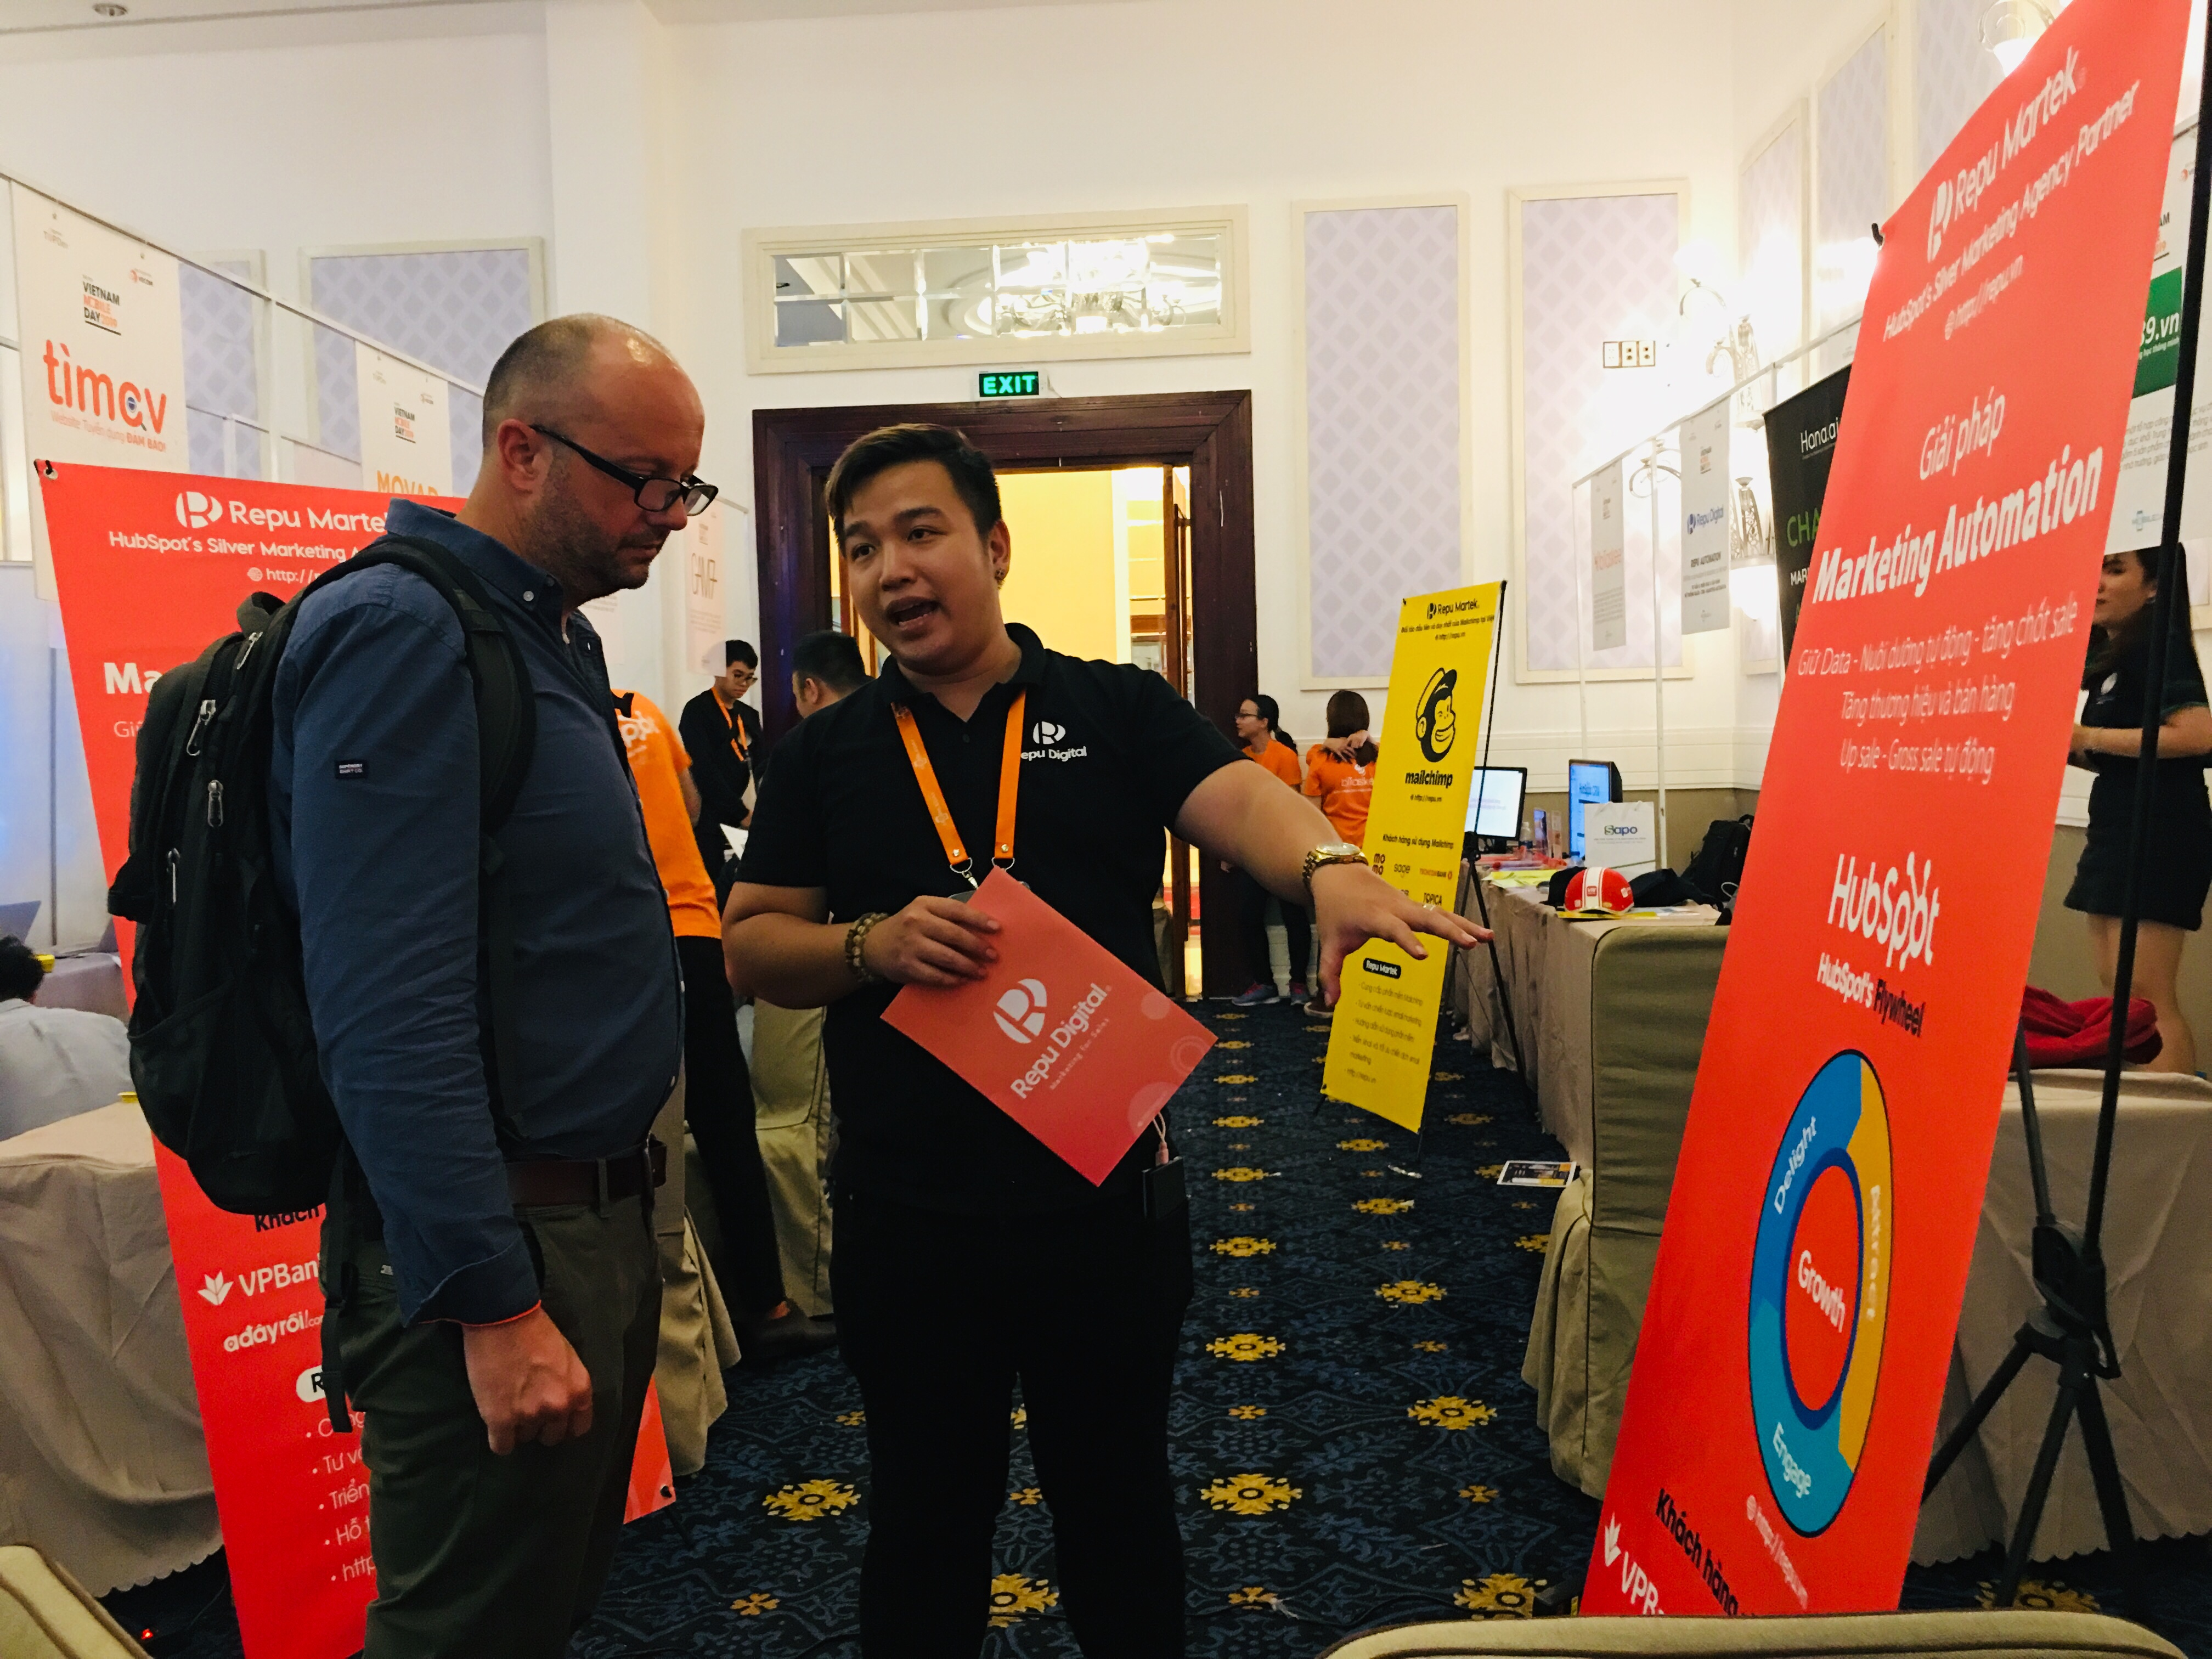 HubSpot và Repu Digital tại Vietnam Mobile Day 2019 - Ảnh 02